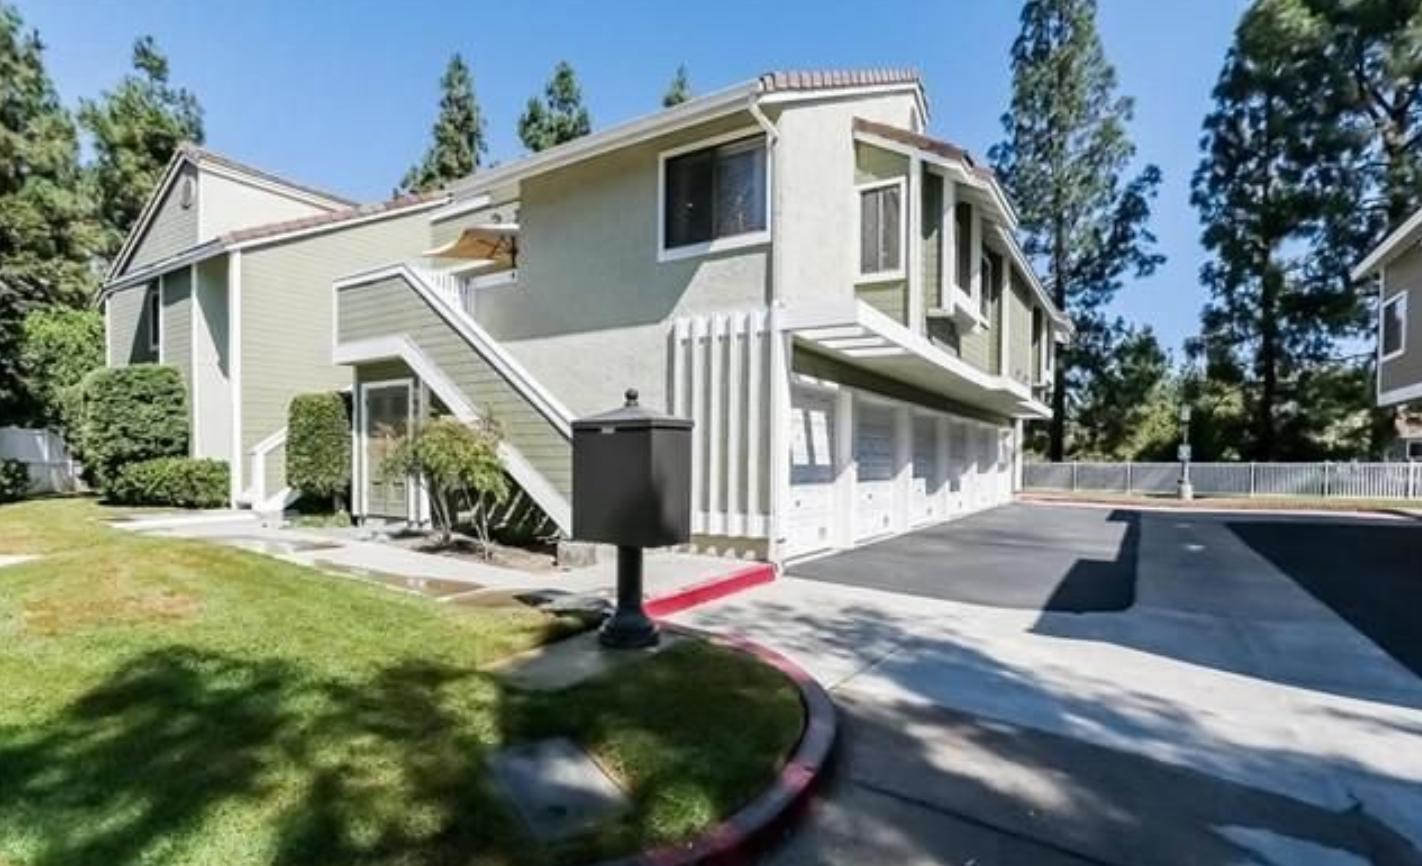 Aliso Viejo, California (Los Angeles-Long Beach-Anaheim, CA); list price: $299,000; square footage: 685; beds/baths: 1/1